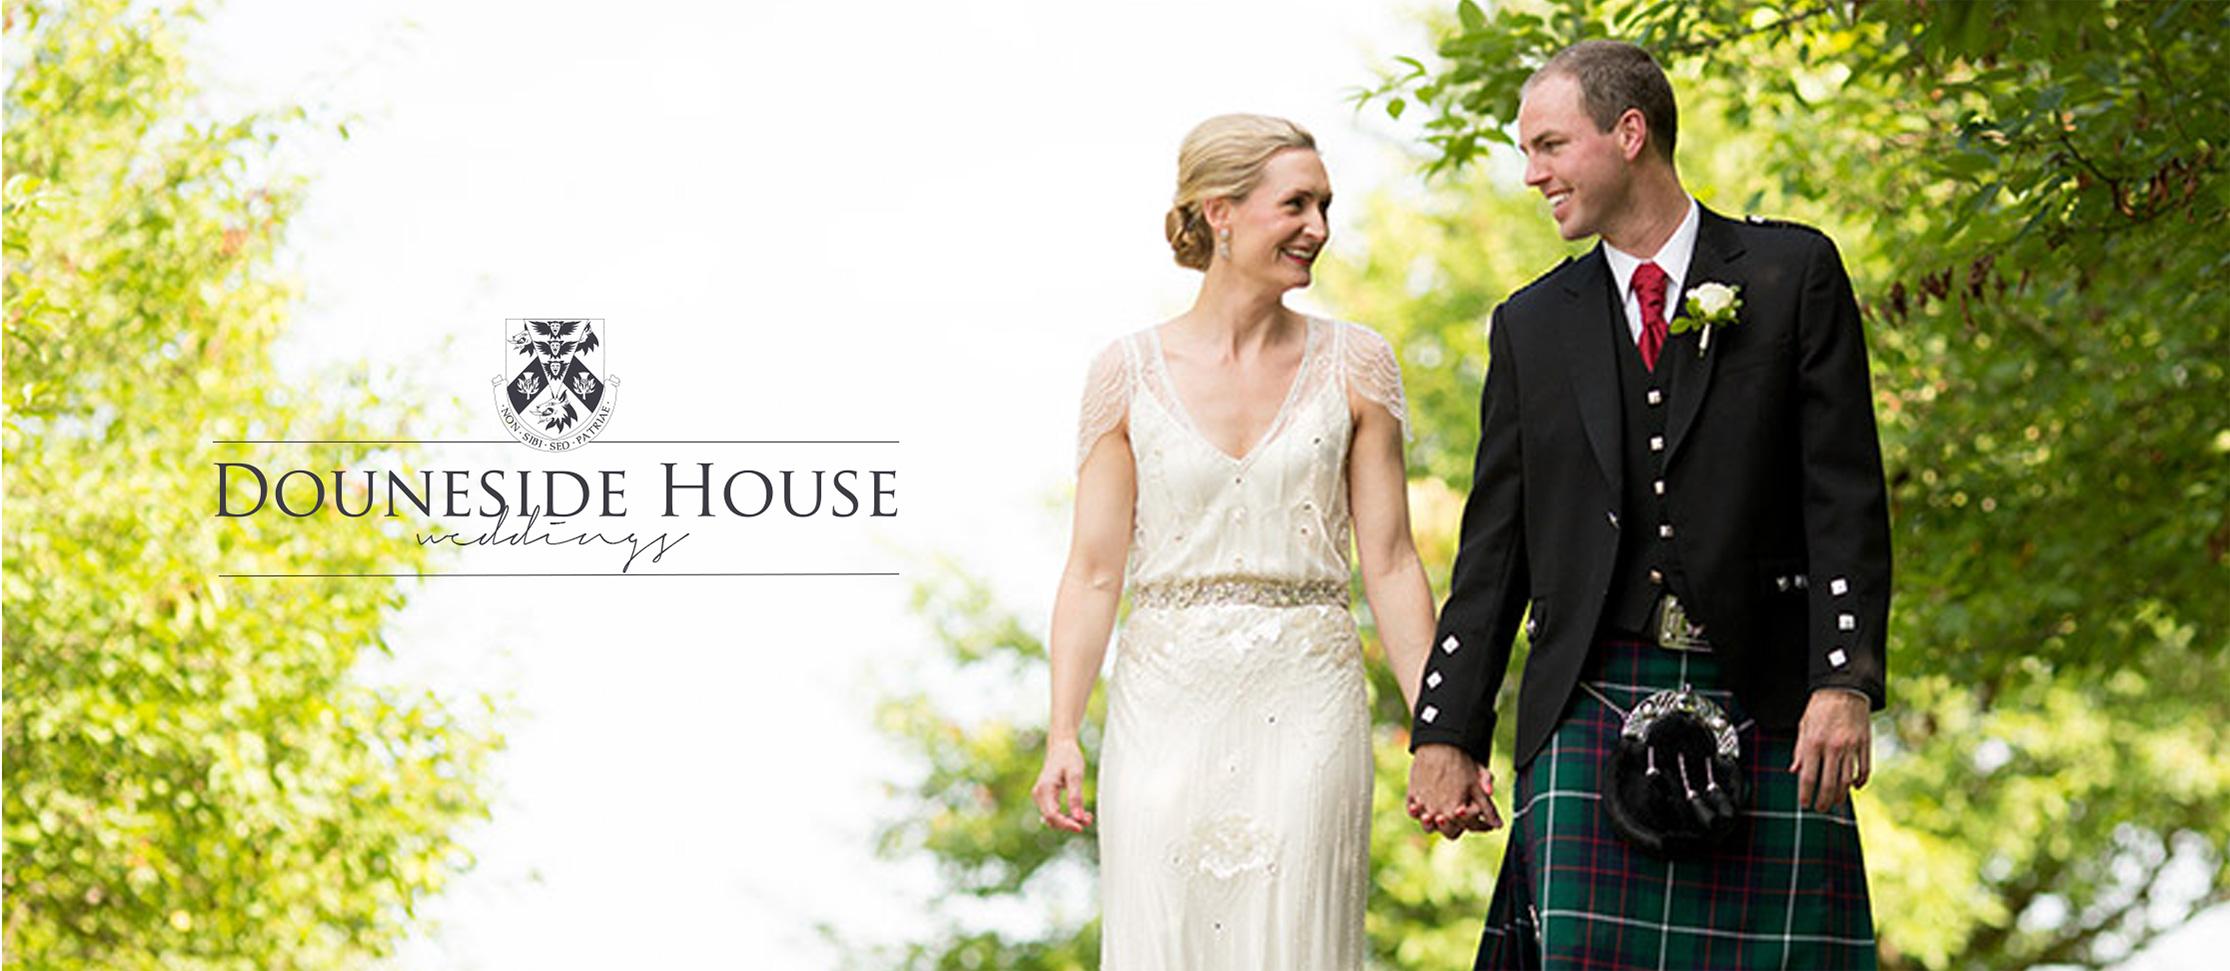 douneside house banner image